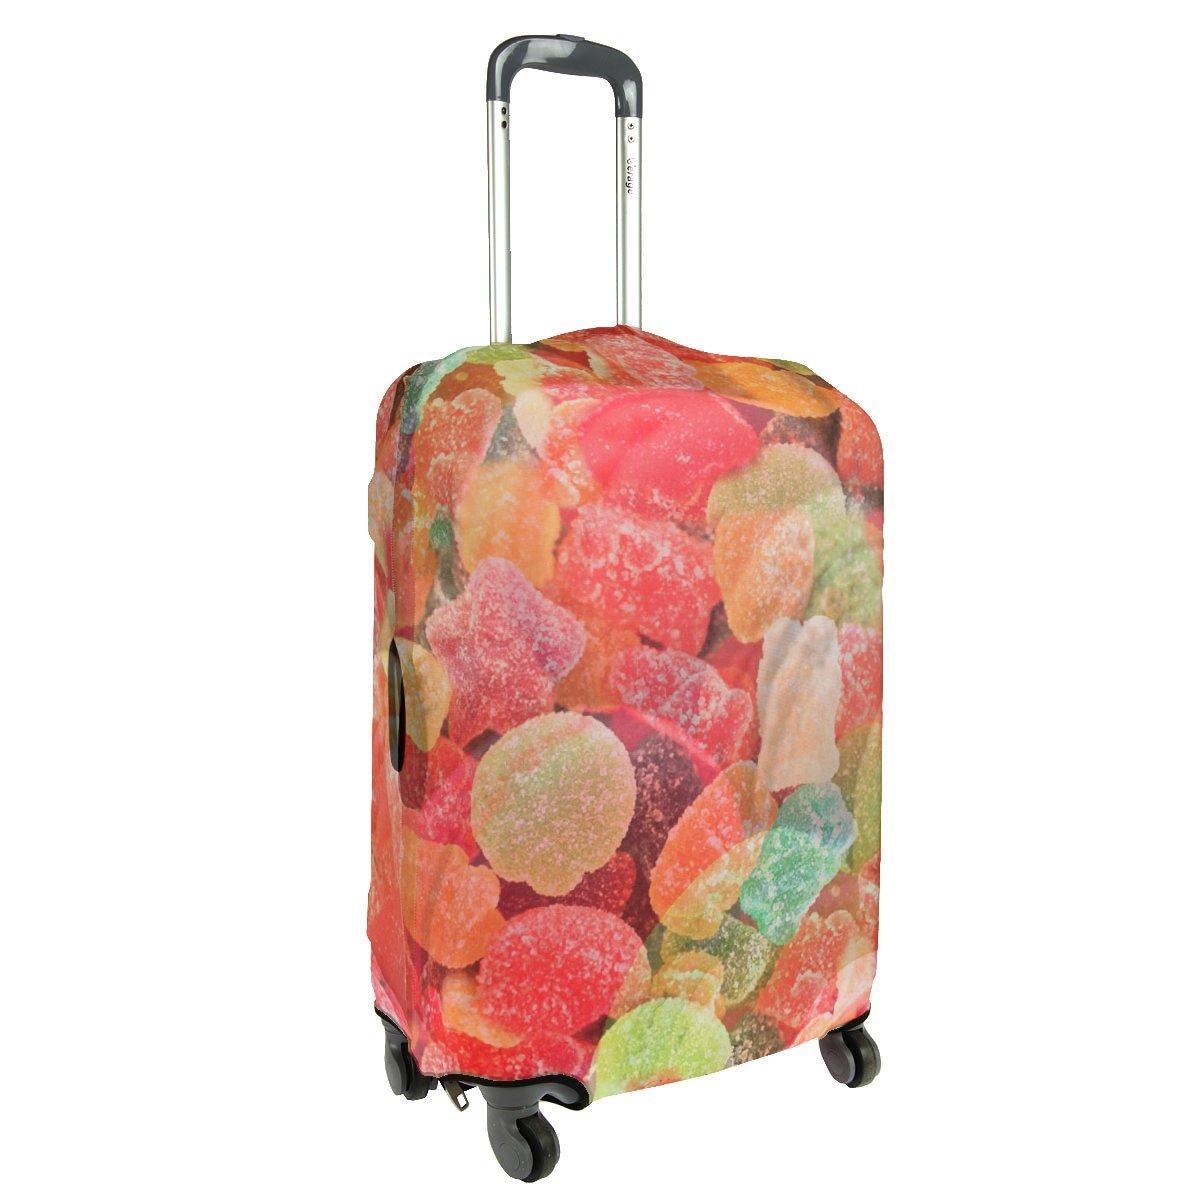 Защитное покрытие для чемодана Gianni Conti 9016 S.